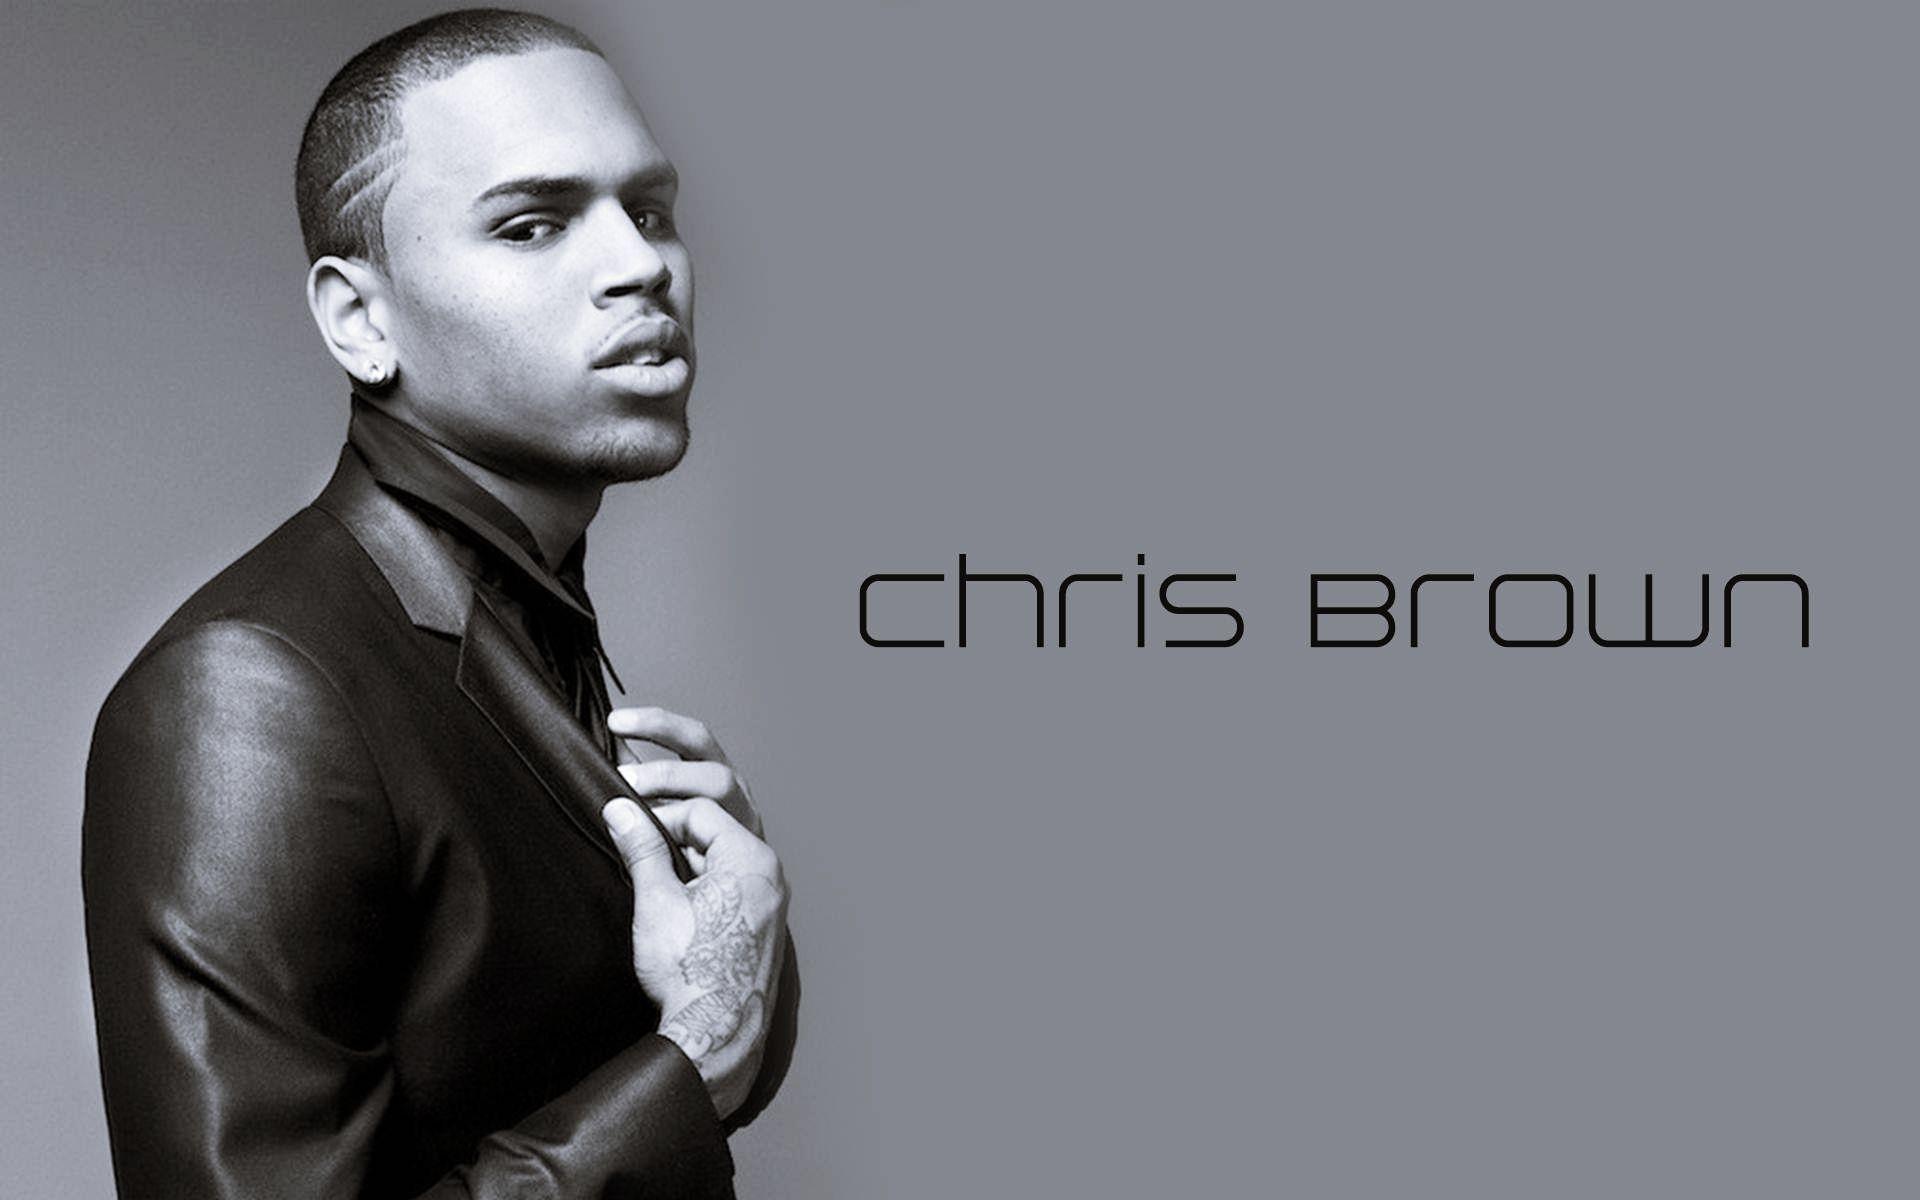 Hd wallpaper man - Chris Brown Hd Wallpapers